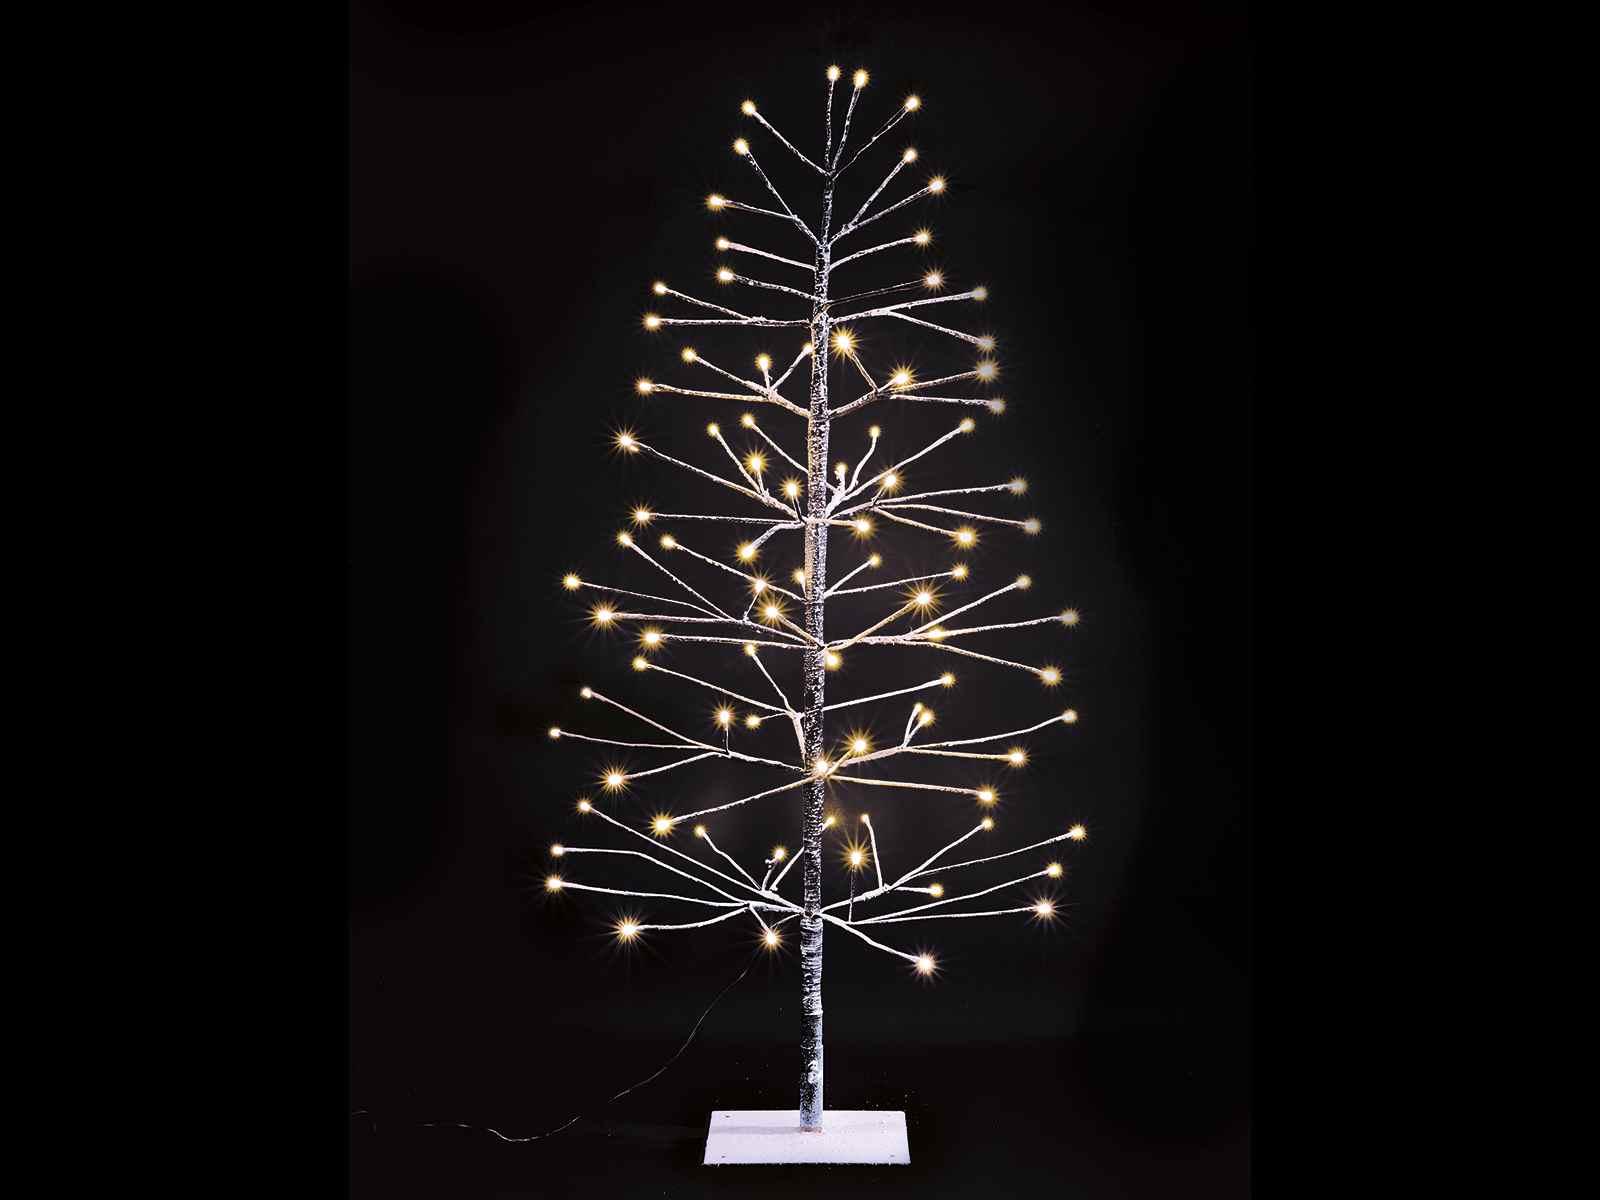 Arbol Navideno Con 96 Luces Led Blanco Calido 531968 Art From